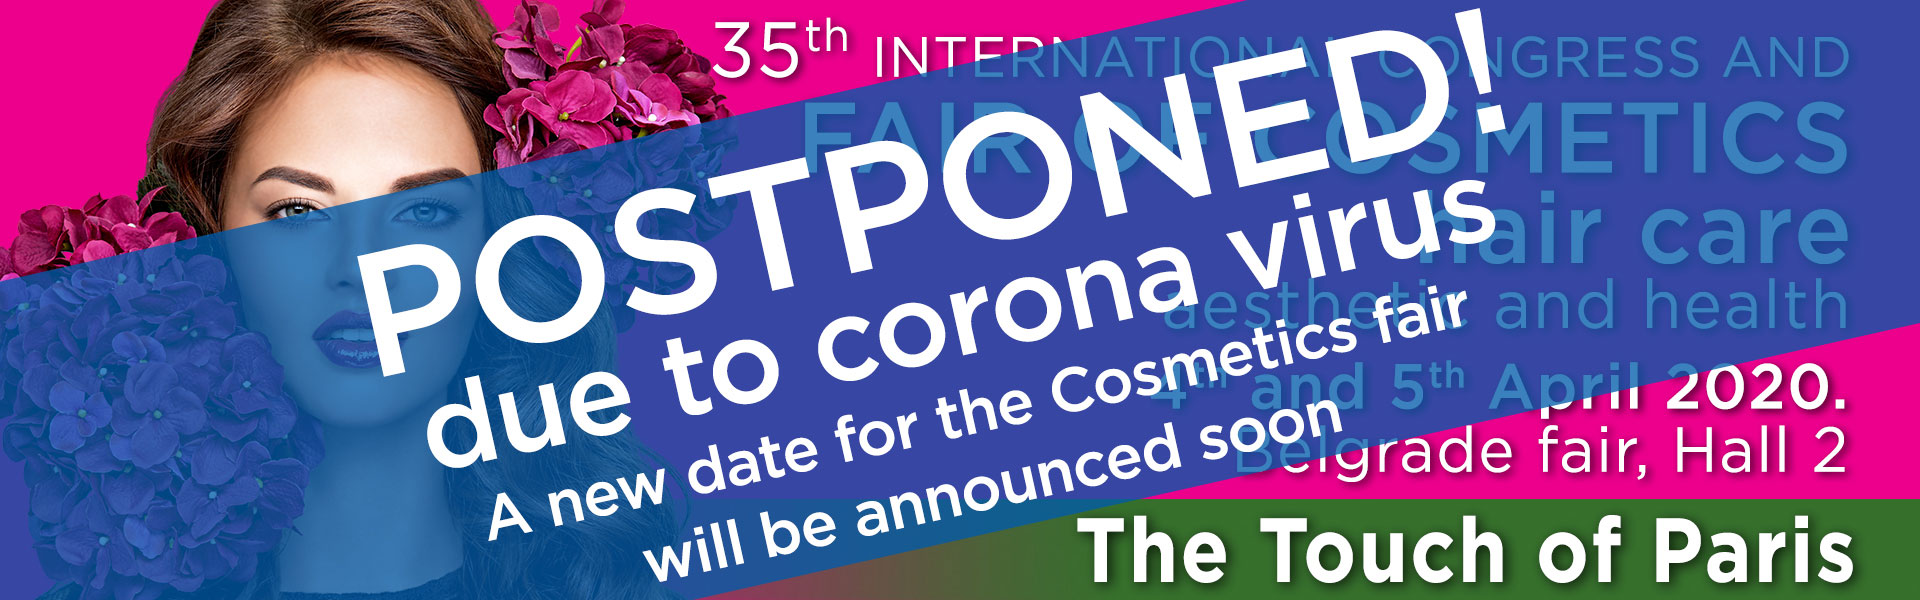 International fair The touch of Paris - postponed due to Coronavirus